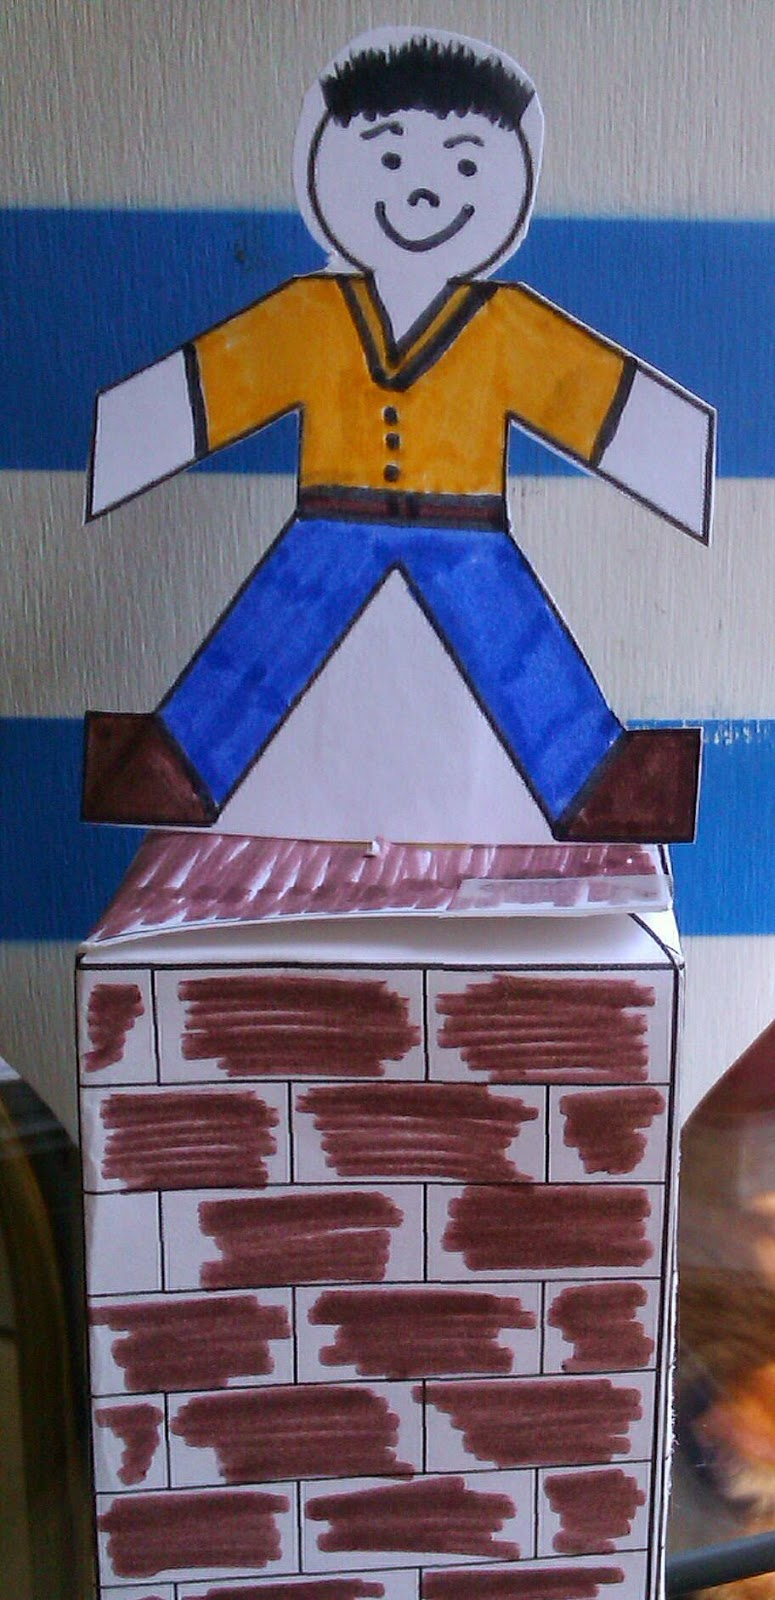 Atractivo Nehemiah Para Colorear Cresta - Enmarcado Para Colorear ...